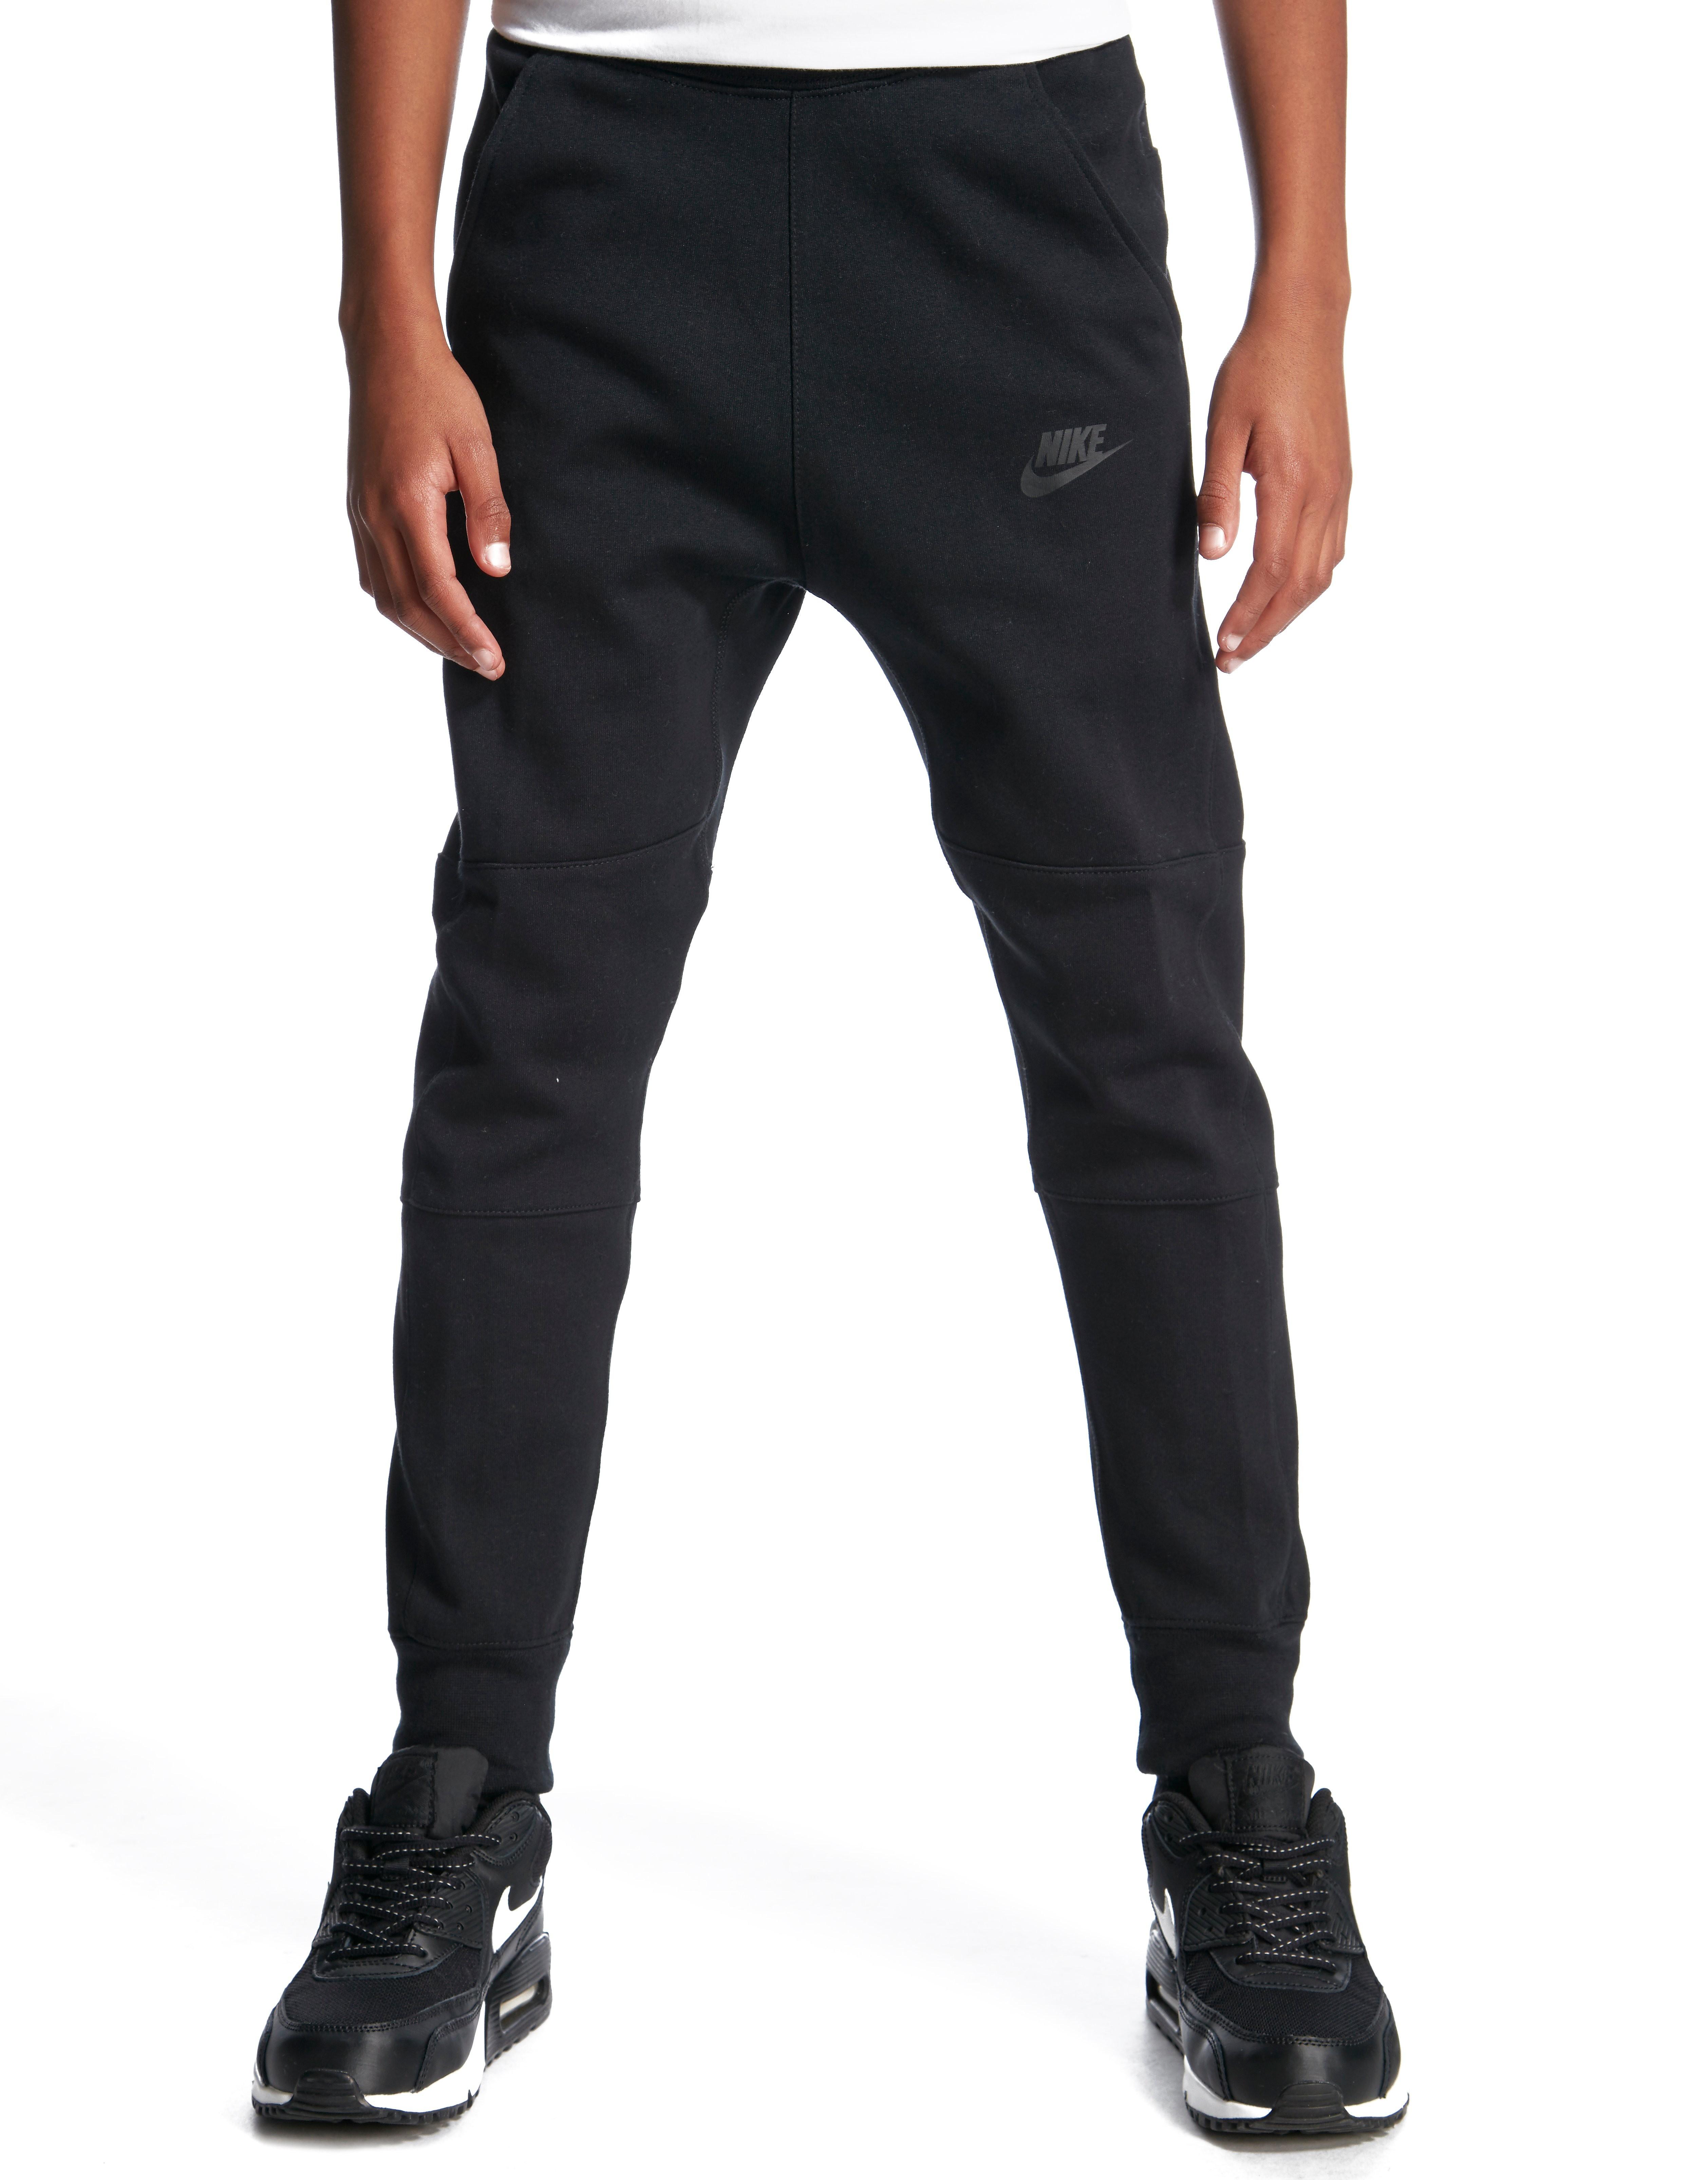 c60c96039ffd Nike Tech Fleece Pant Junior - Black - Kids - Sports King Store